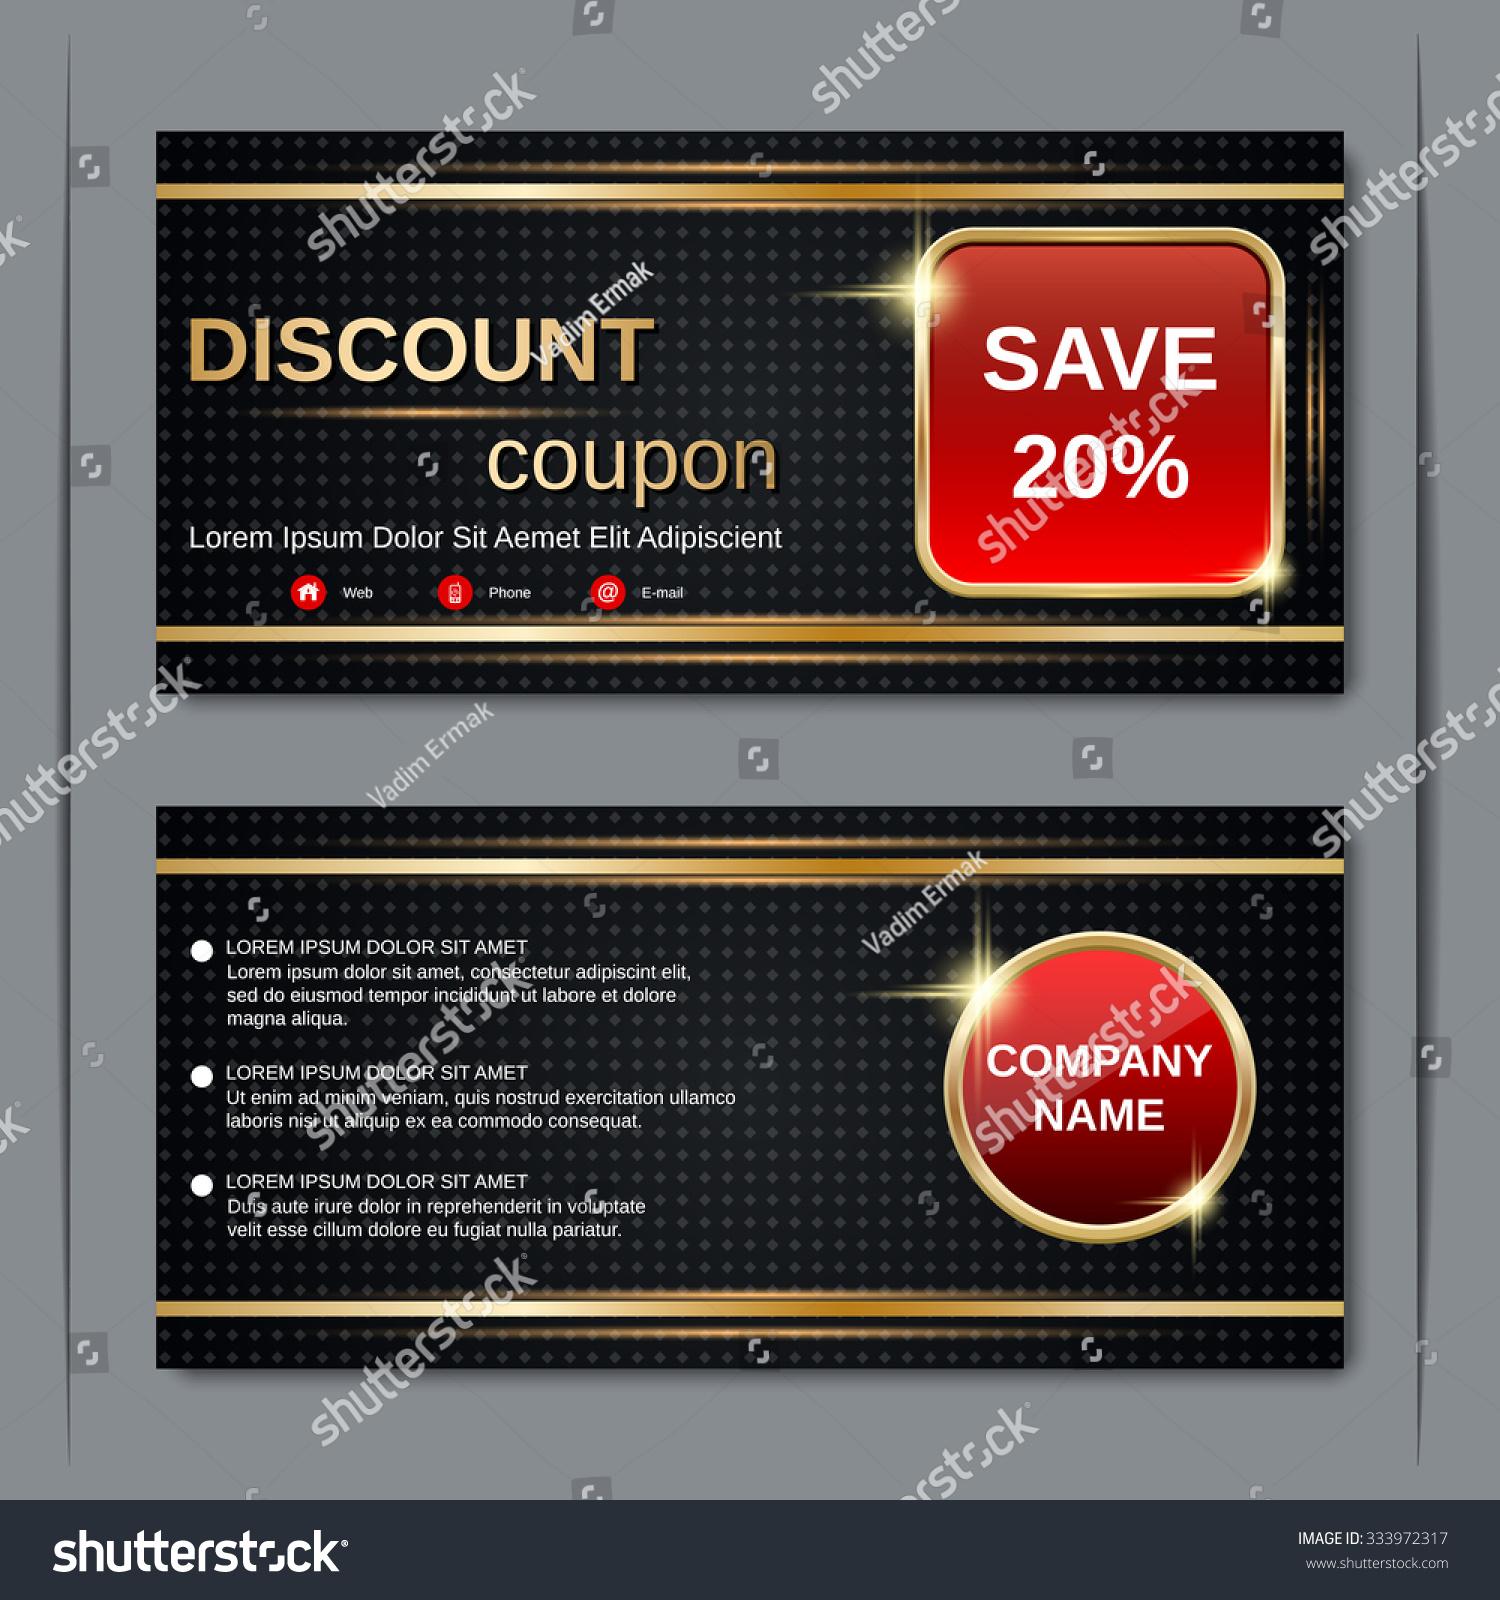 Doc13001390 Discount Voucher Design Discount Voucher Design – Discount Voucher Design